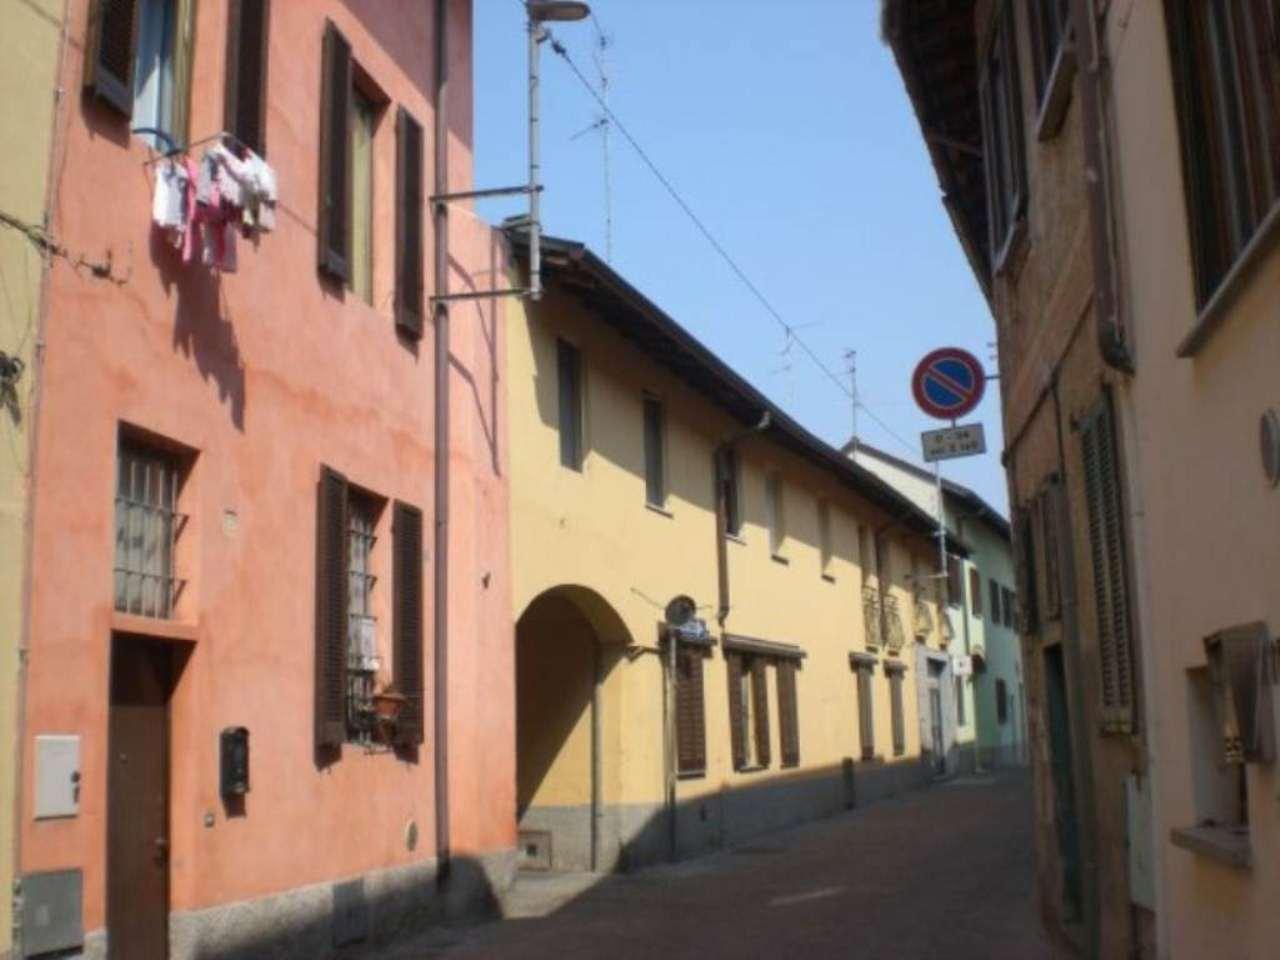 Bilocale Cavenago di Brianza Via Luigi Besana 10